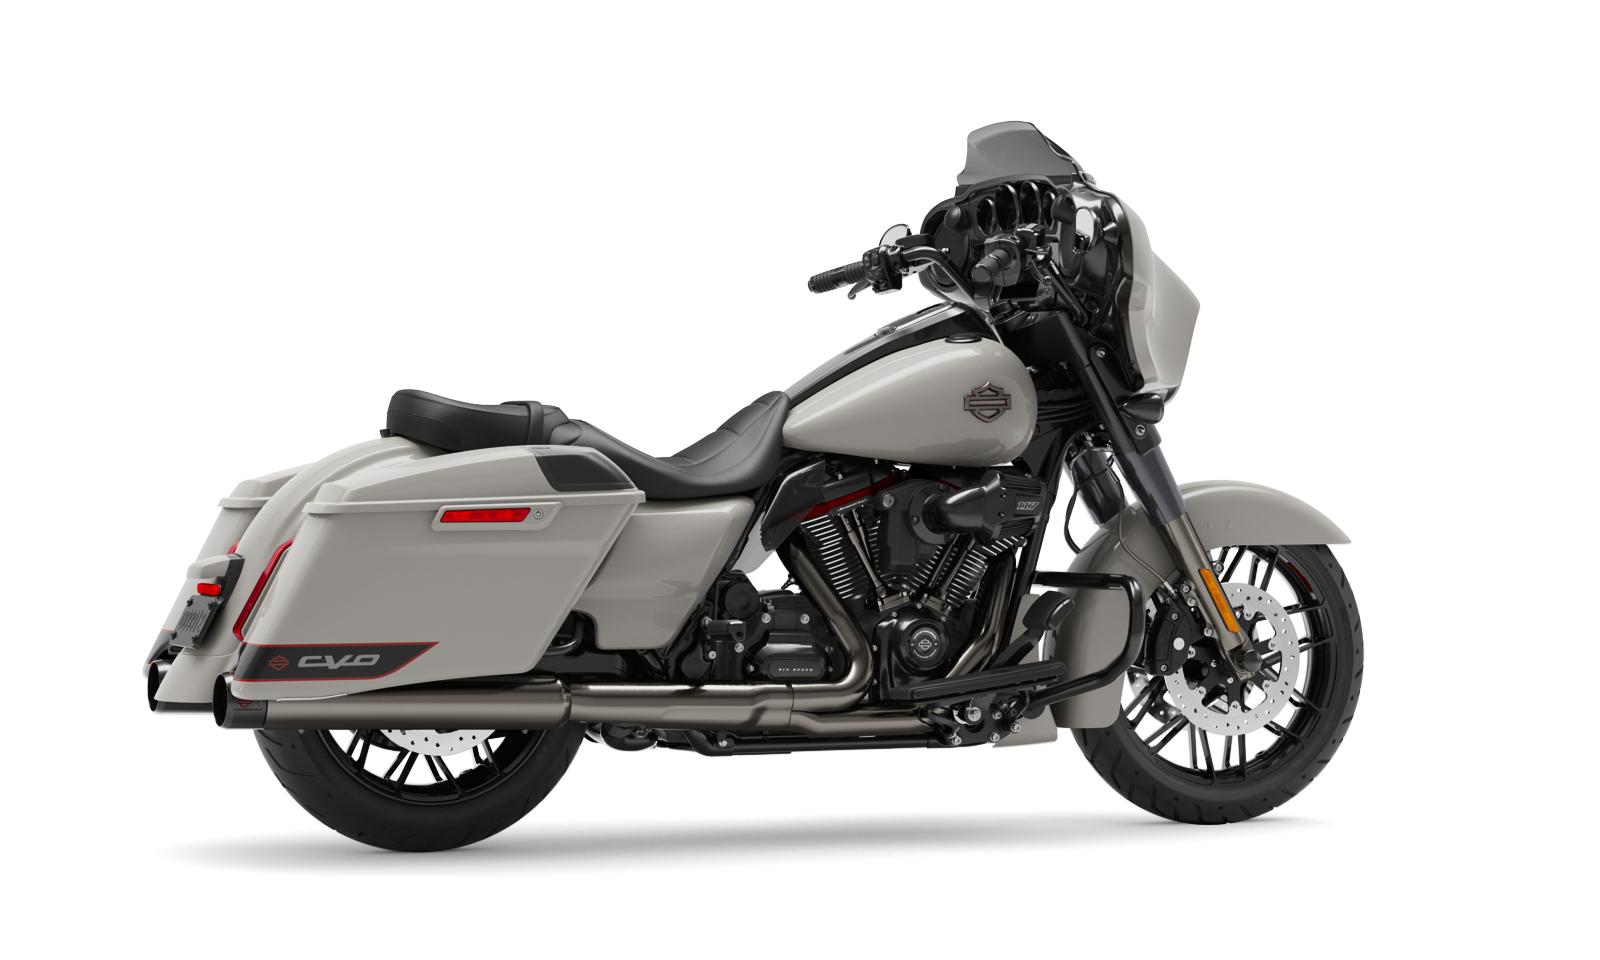 2020 Cvo Street Glide Motorcycle Harley Davidson Brasil